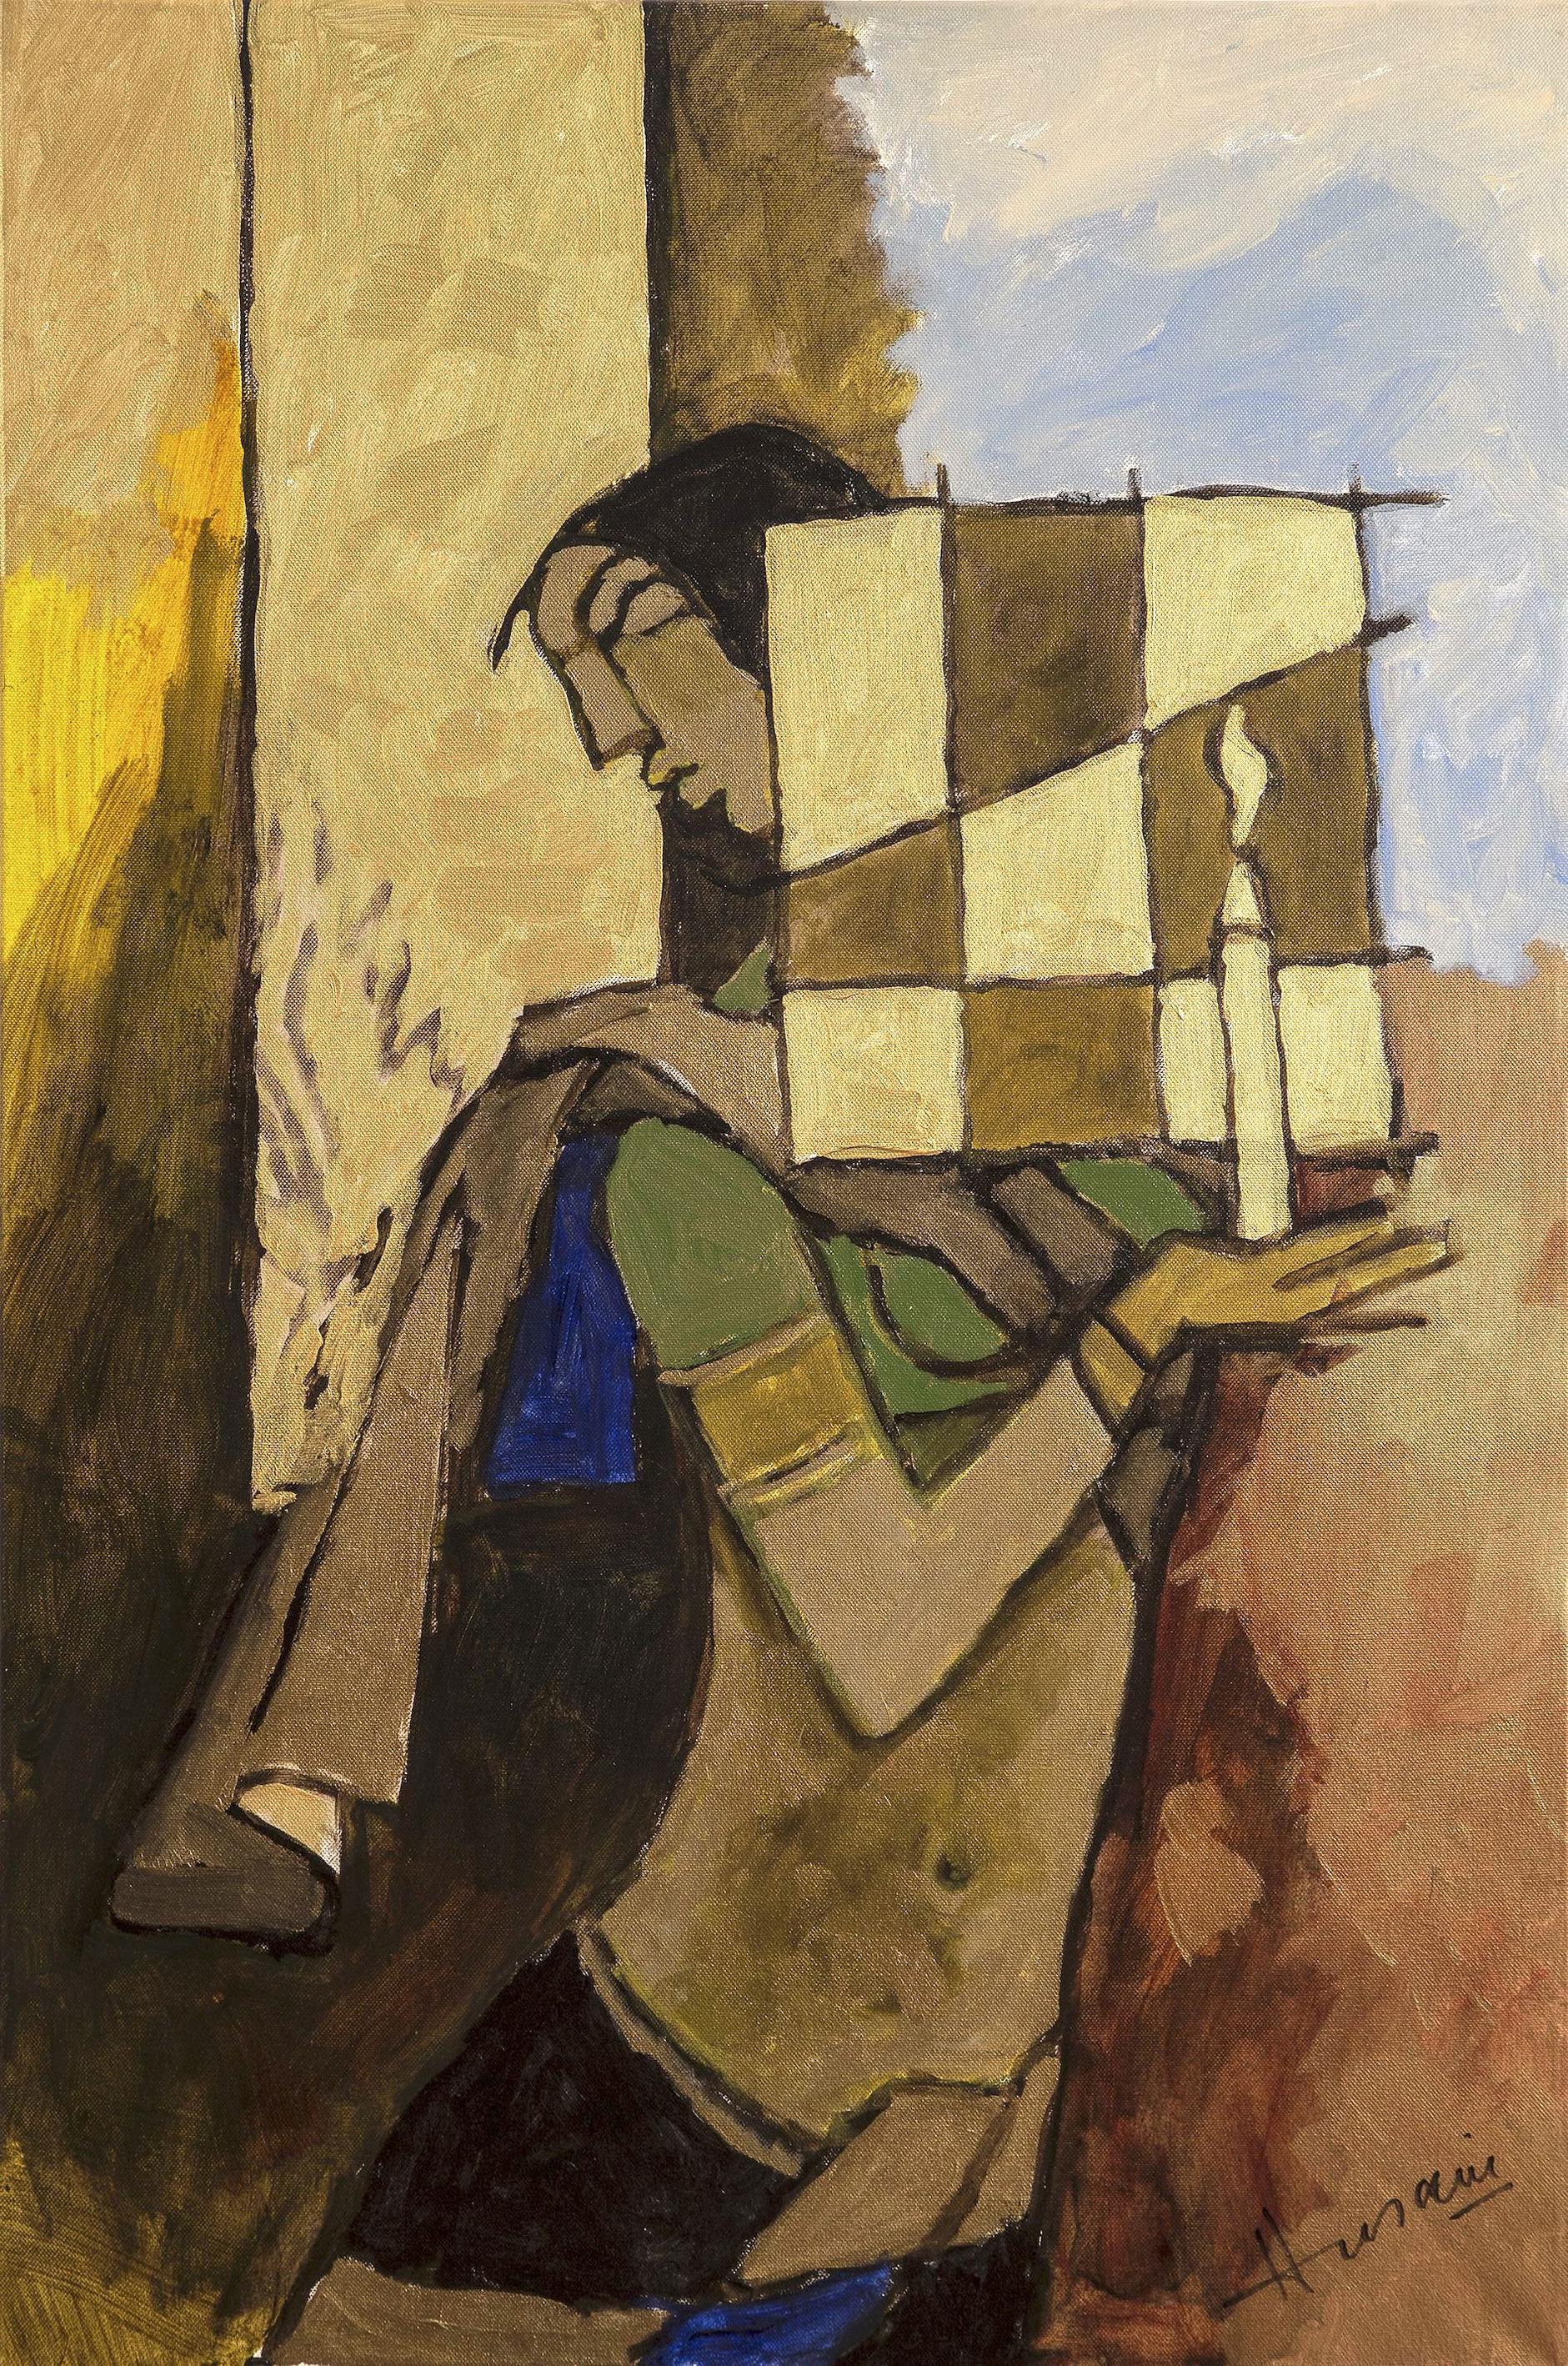 Maqbool Fida Husain-Untitled (Lady With A Candle)-2005